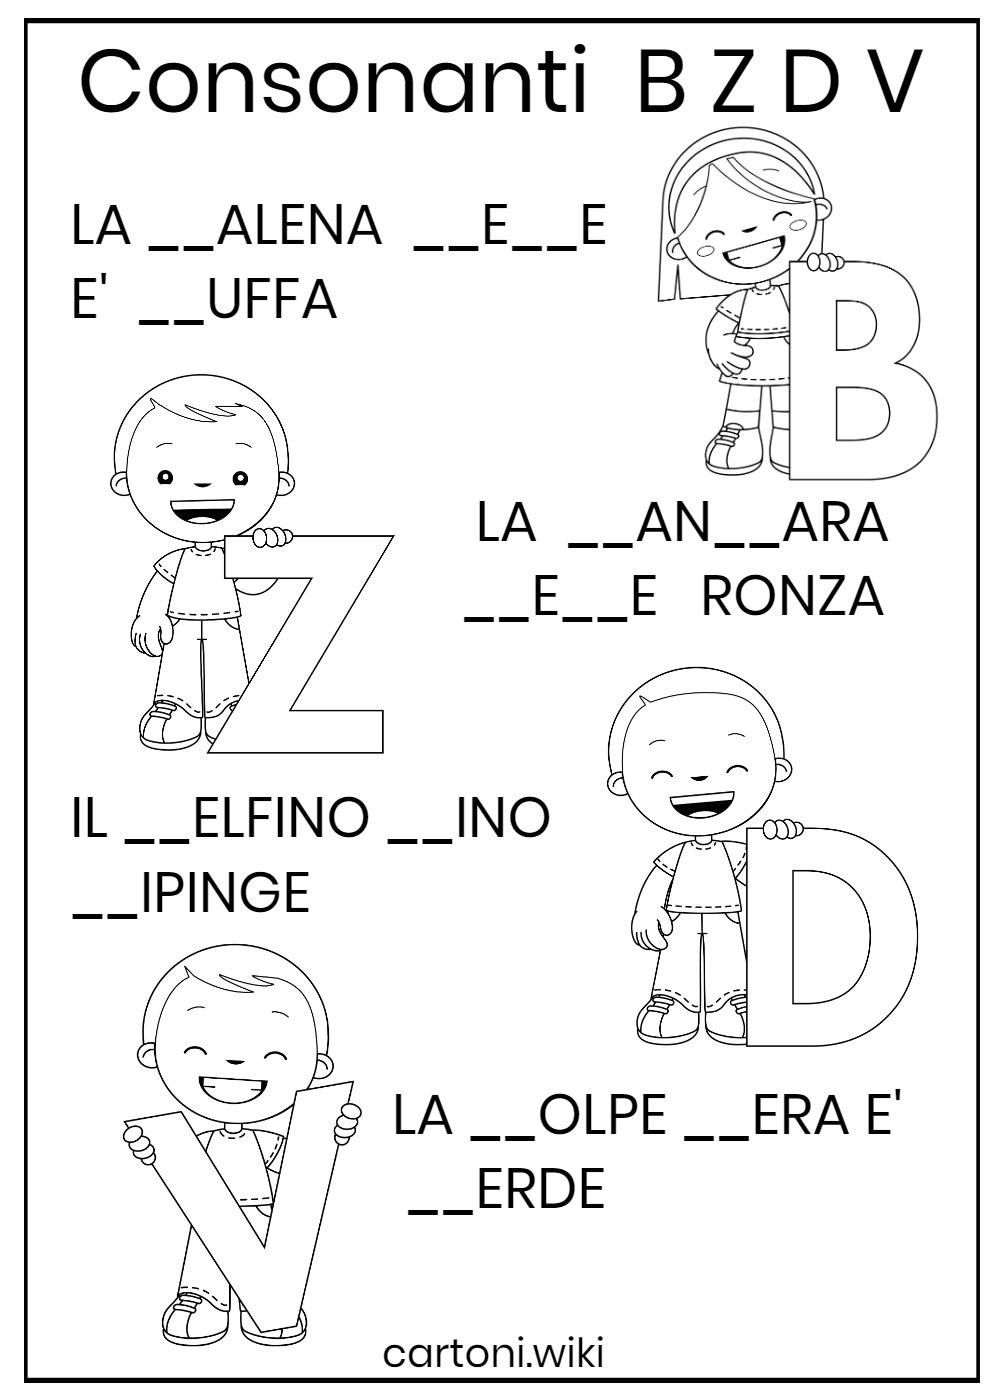 Consonanti B Z D V